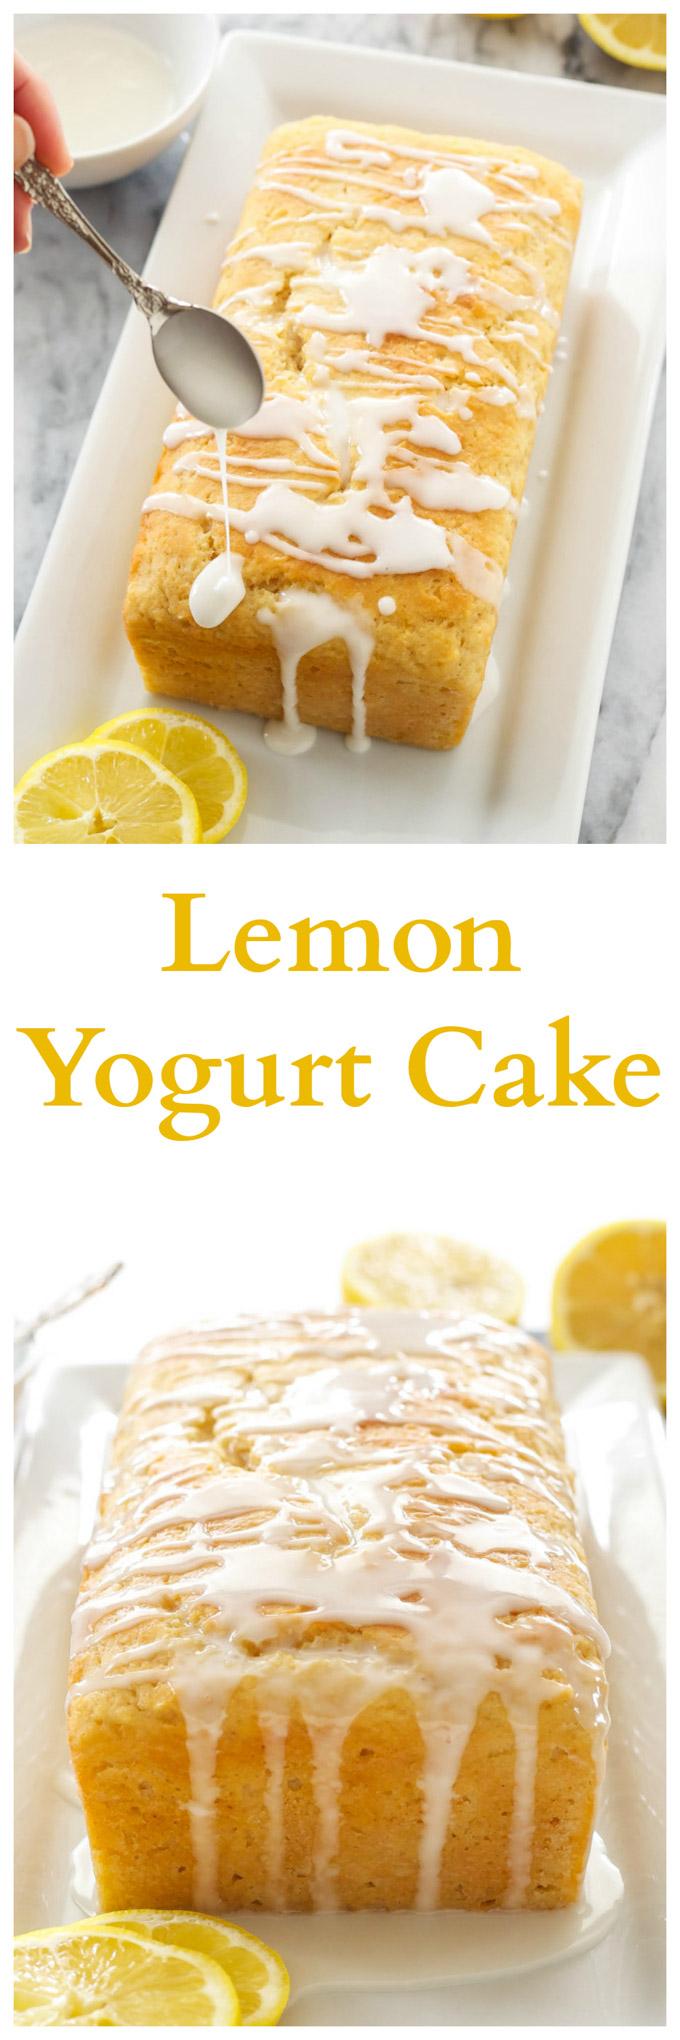 Lemon Yogurt Cake | This lemony cake is the perfect spring dessert!